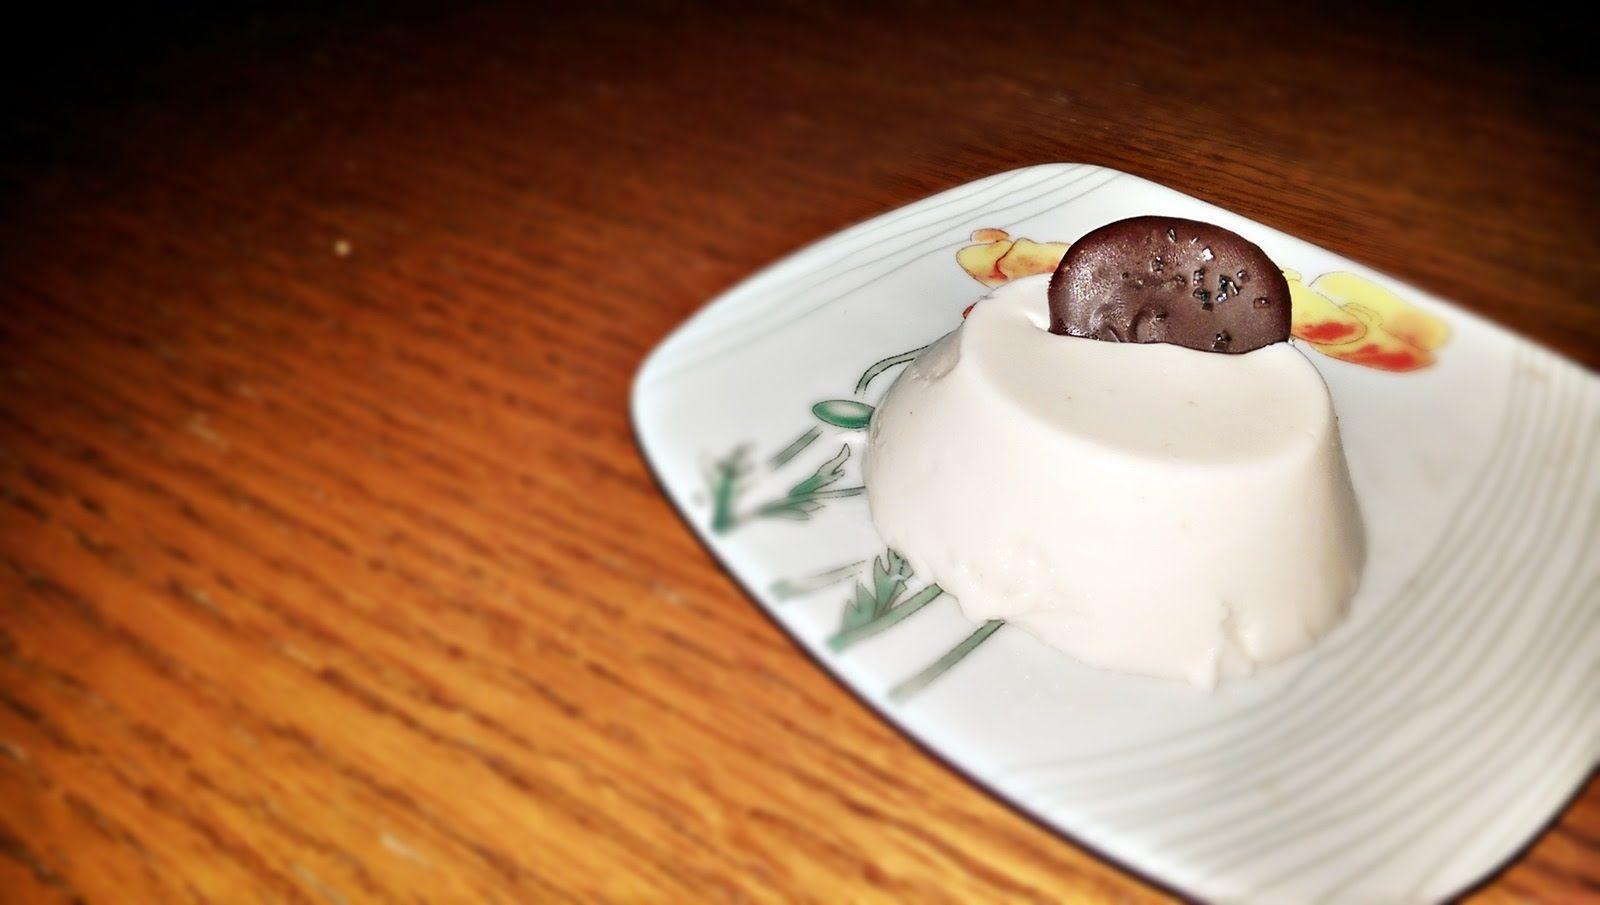 MUY FACIL Gelatina de yogurt griego (Baja en AZÚCAR)